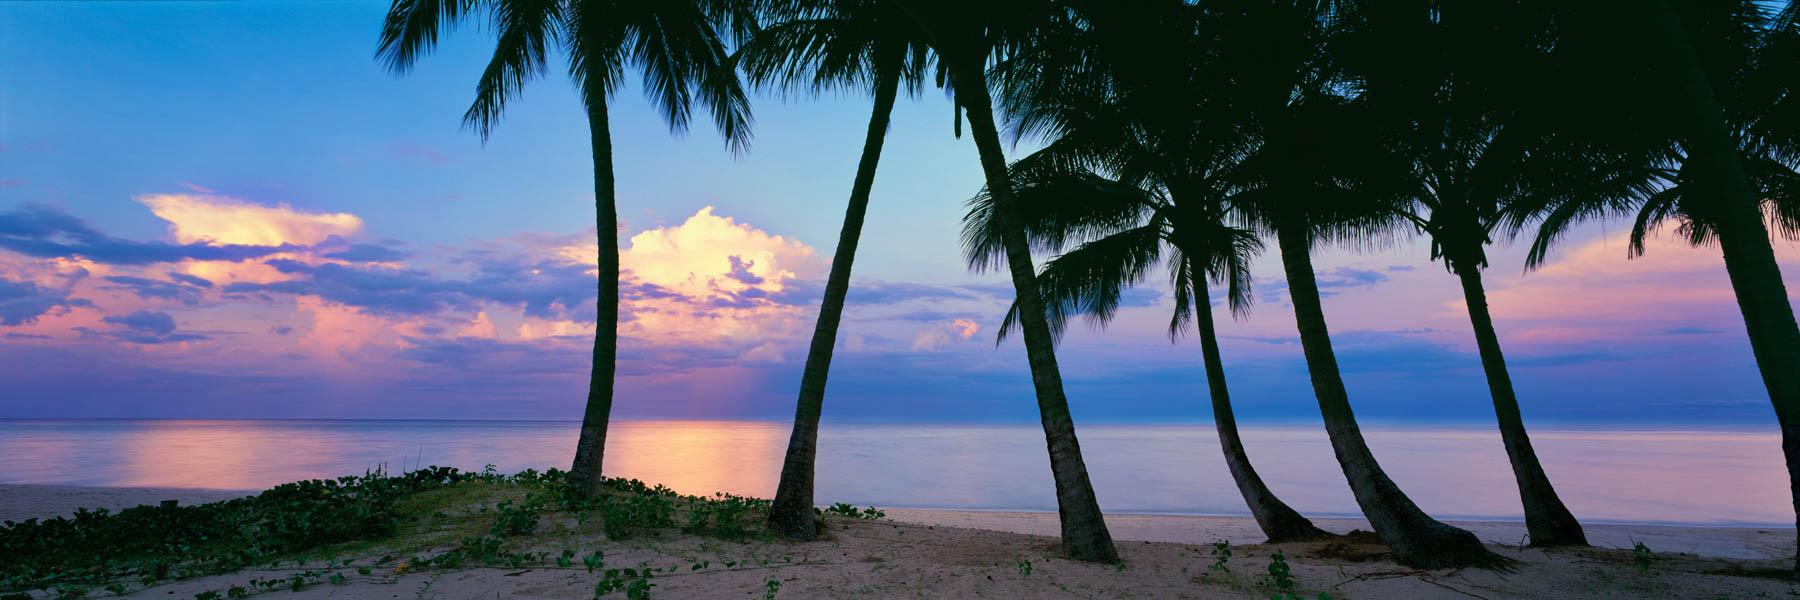 A pastel sunset over Ellis Beach, North Queensland, Australlia.